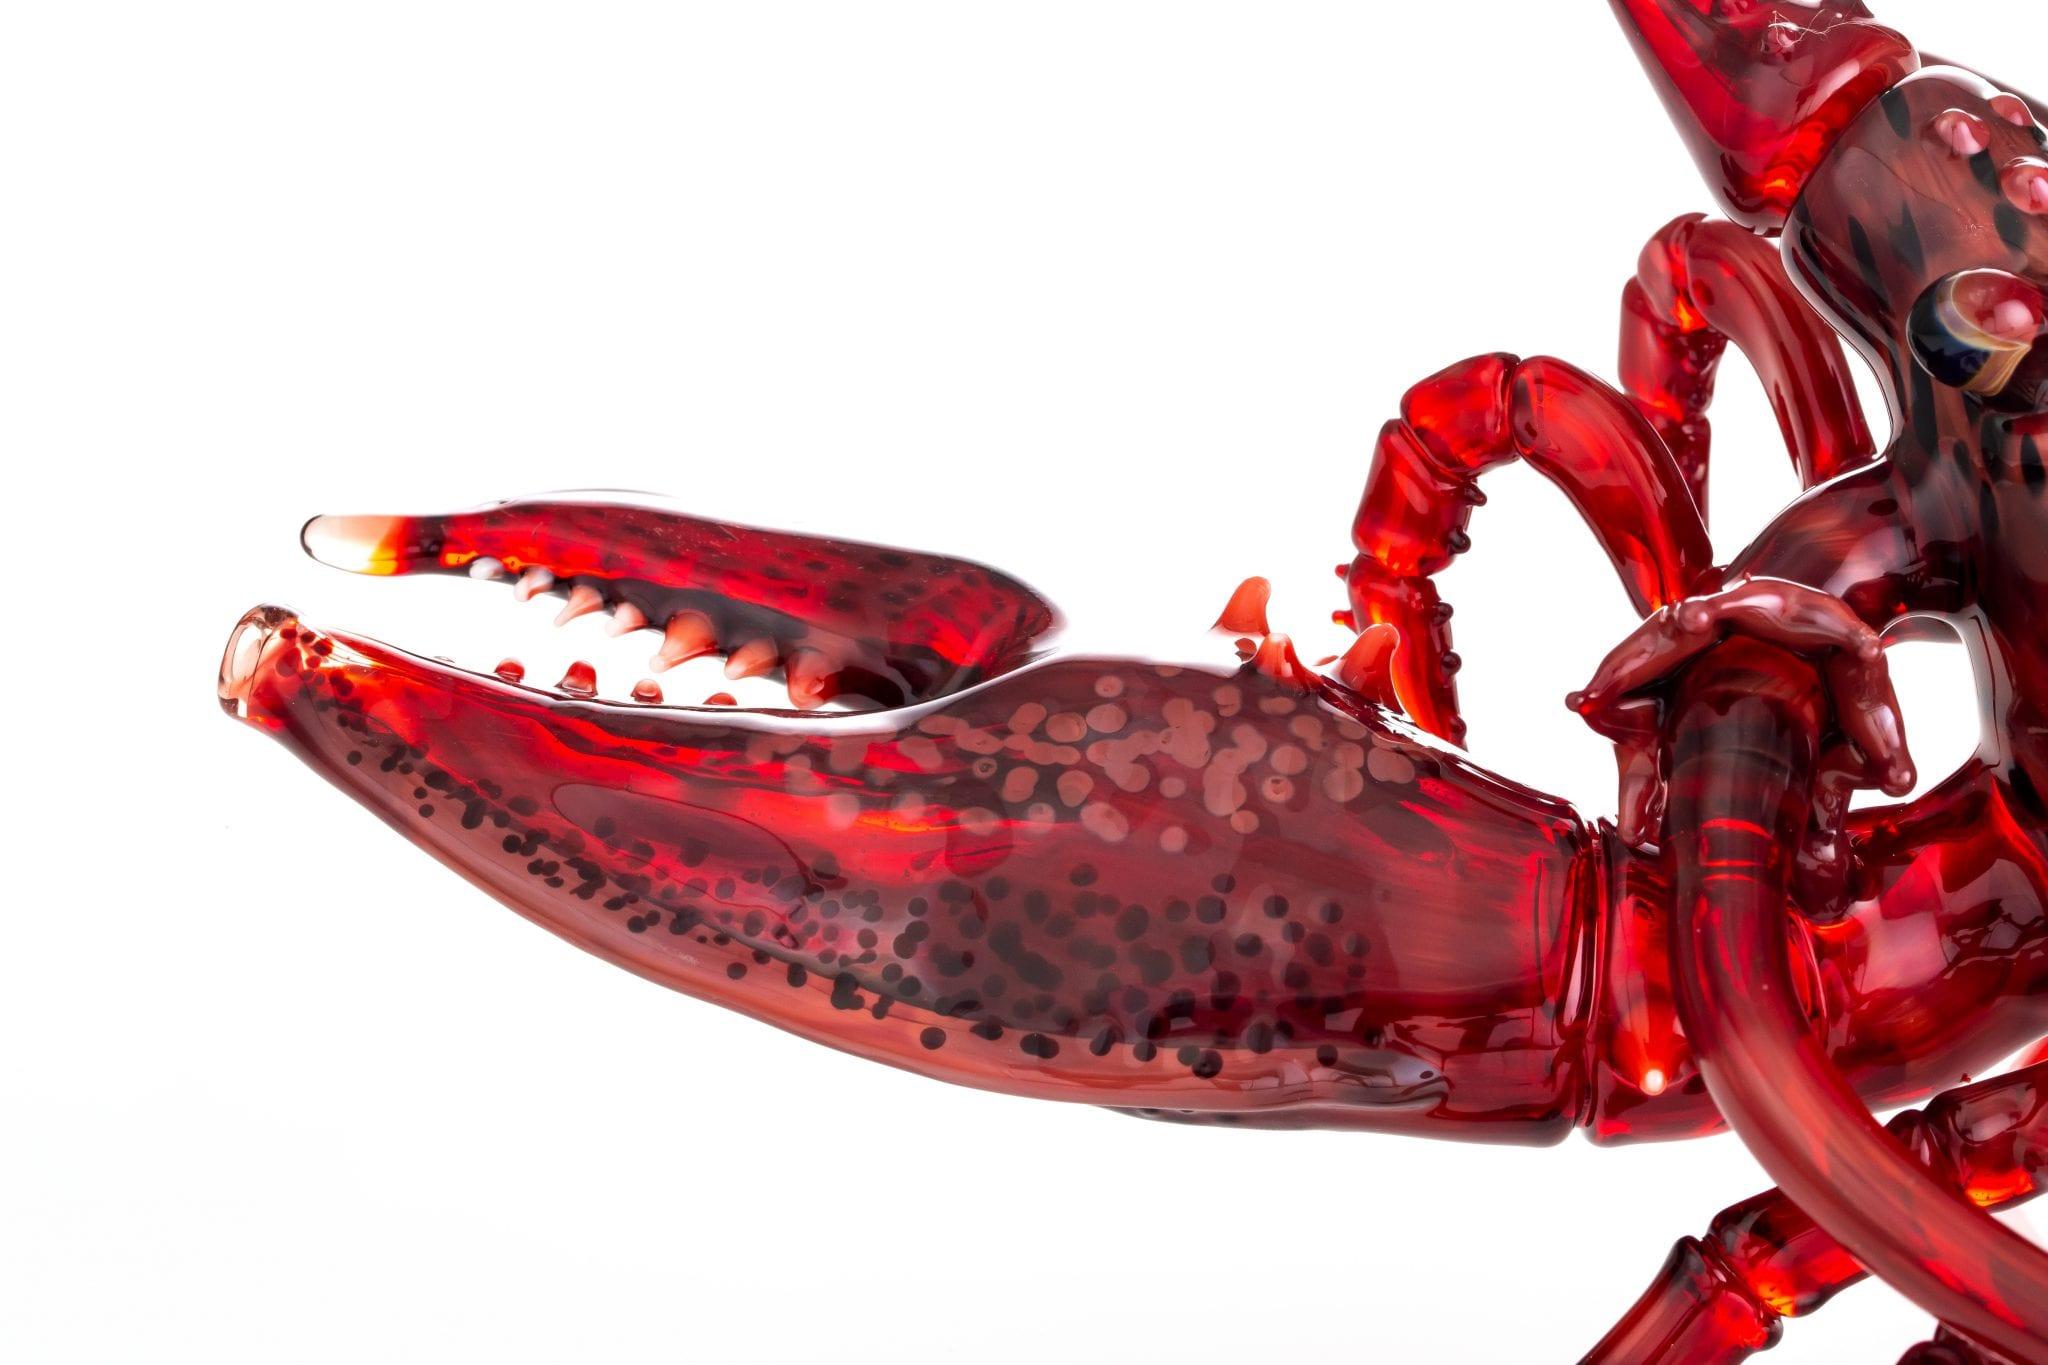 lobsterfunc3-7